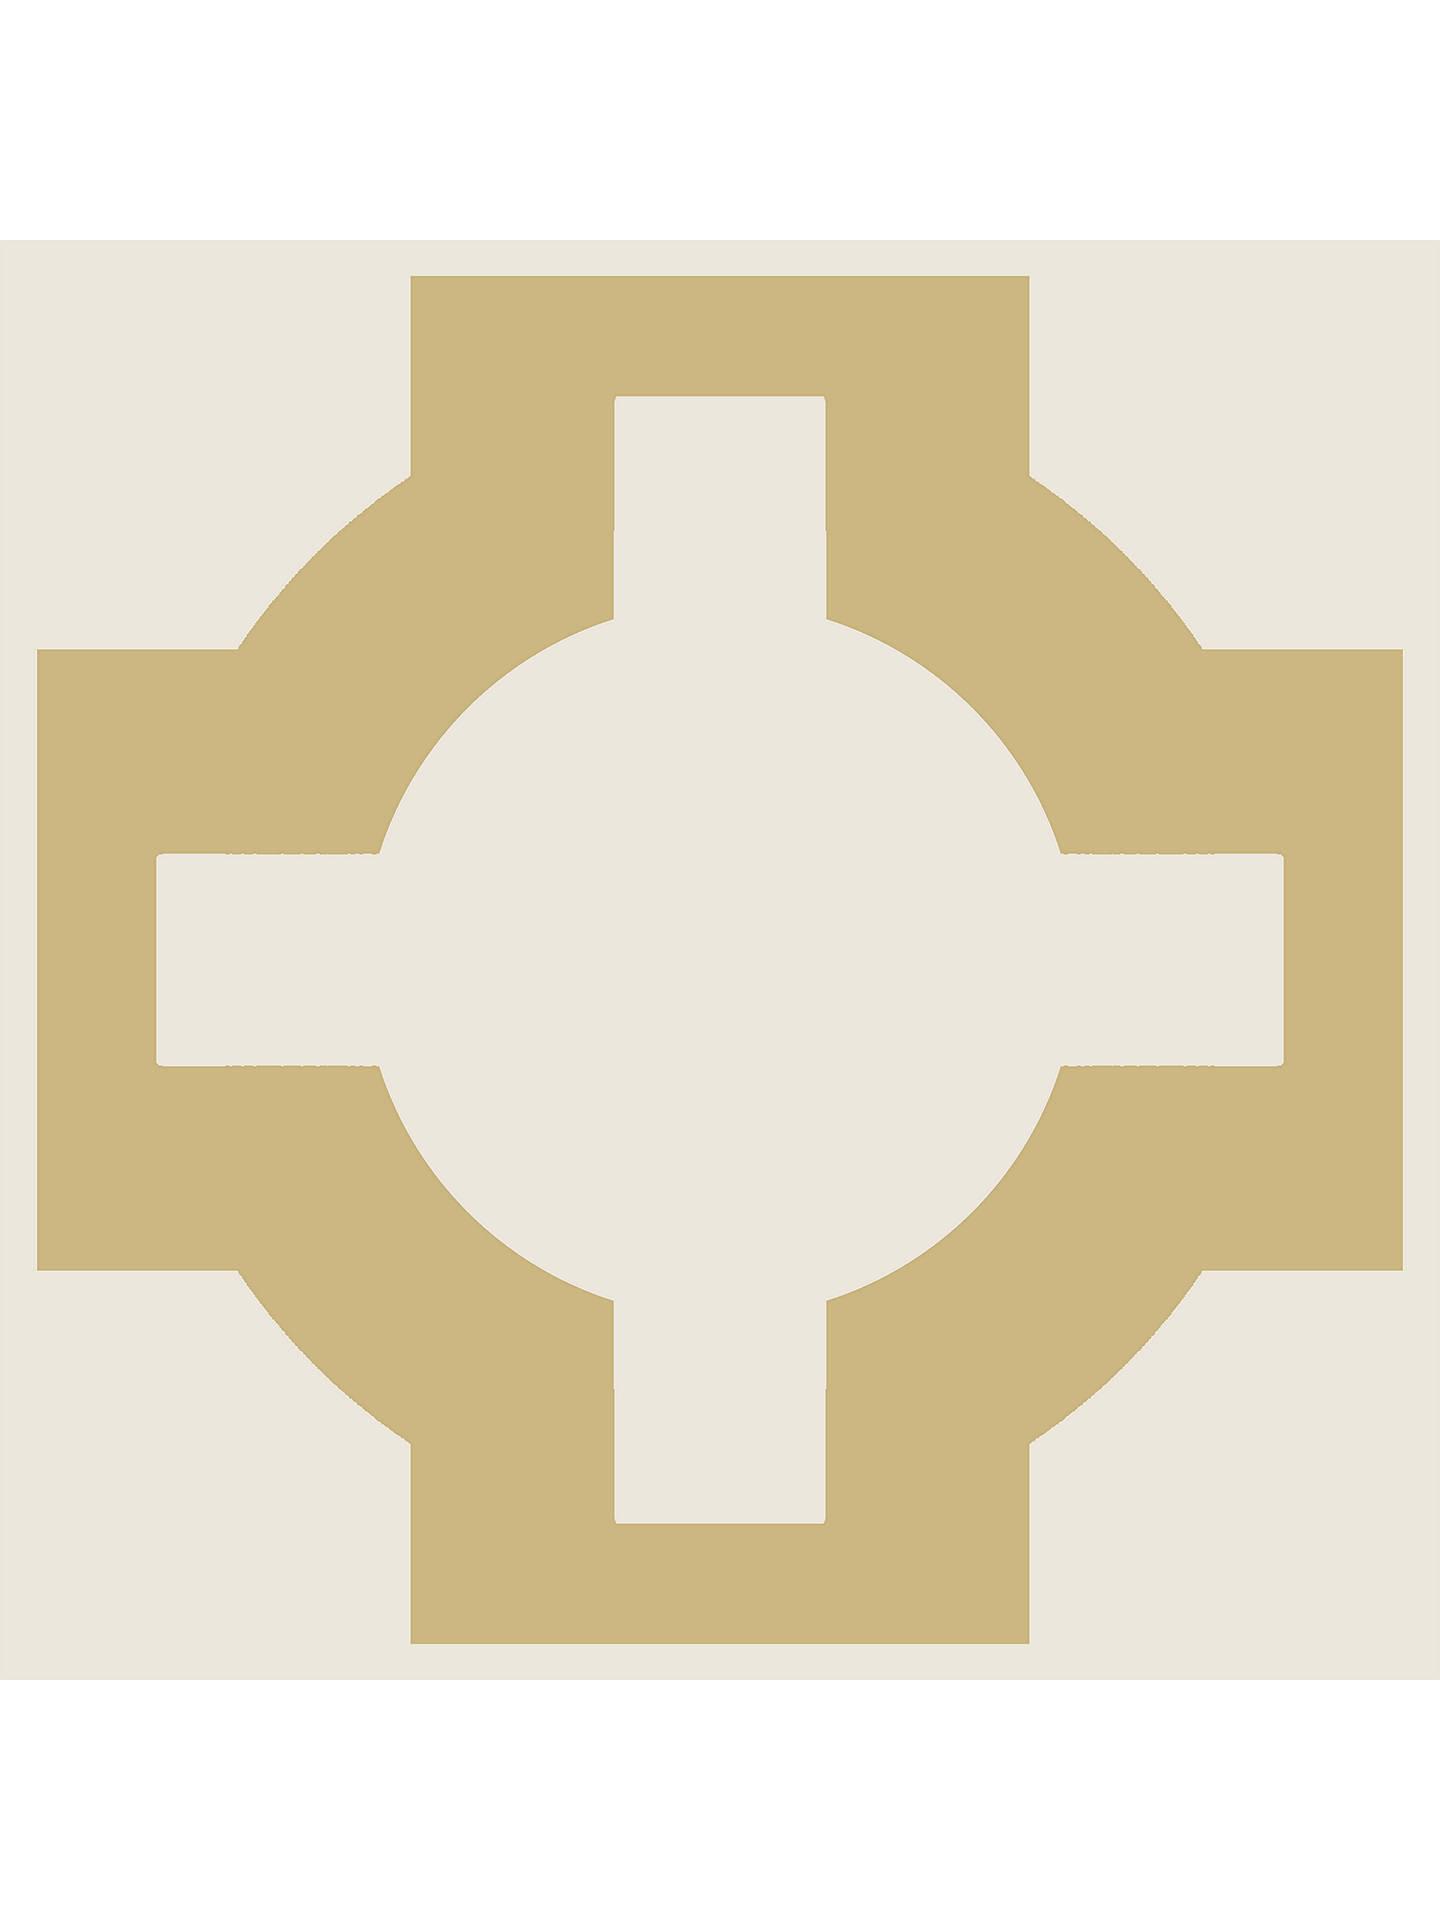 a679951ad Neisha Crosland for Harvey Maria Luxury Vinyl Floor Tiles at John ...